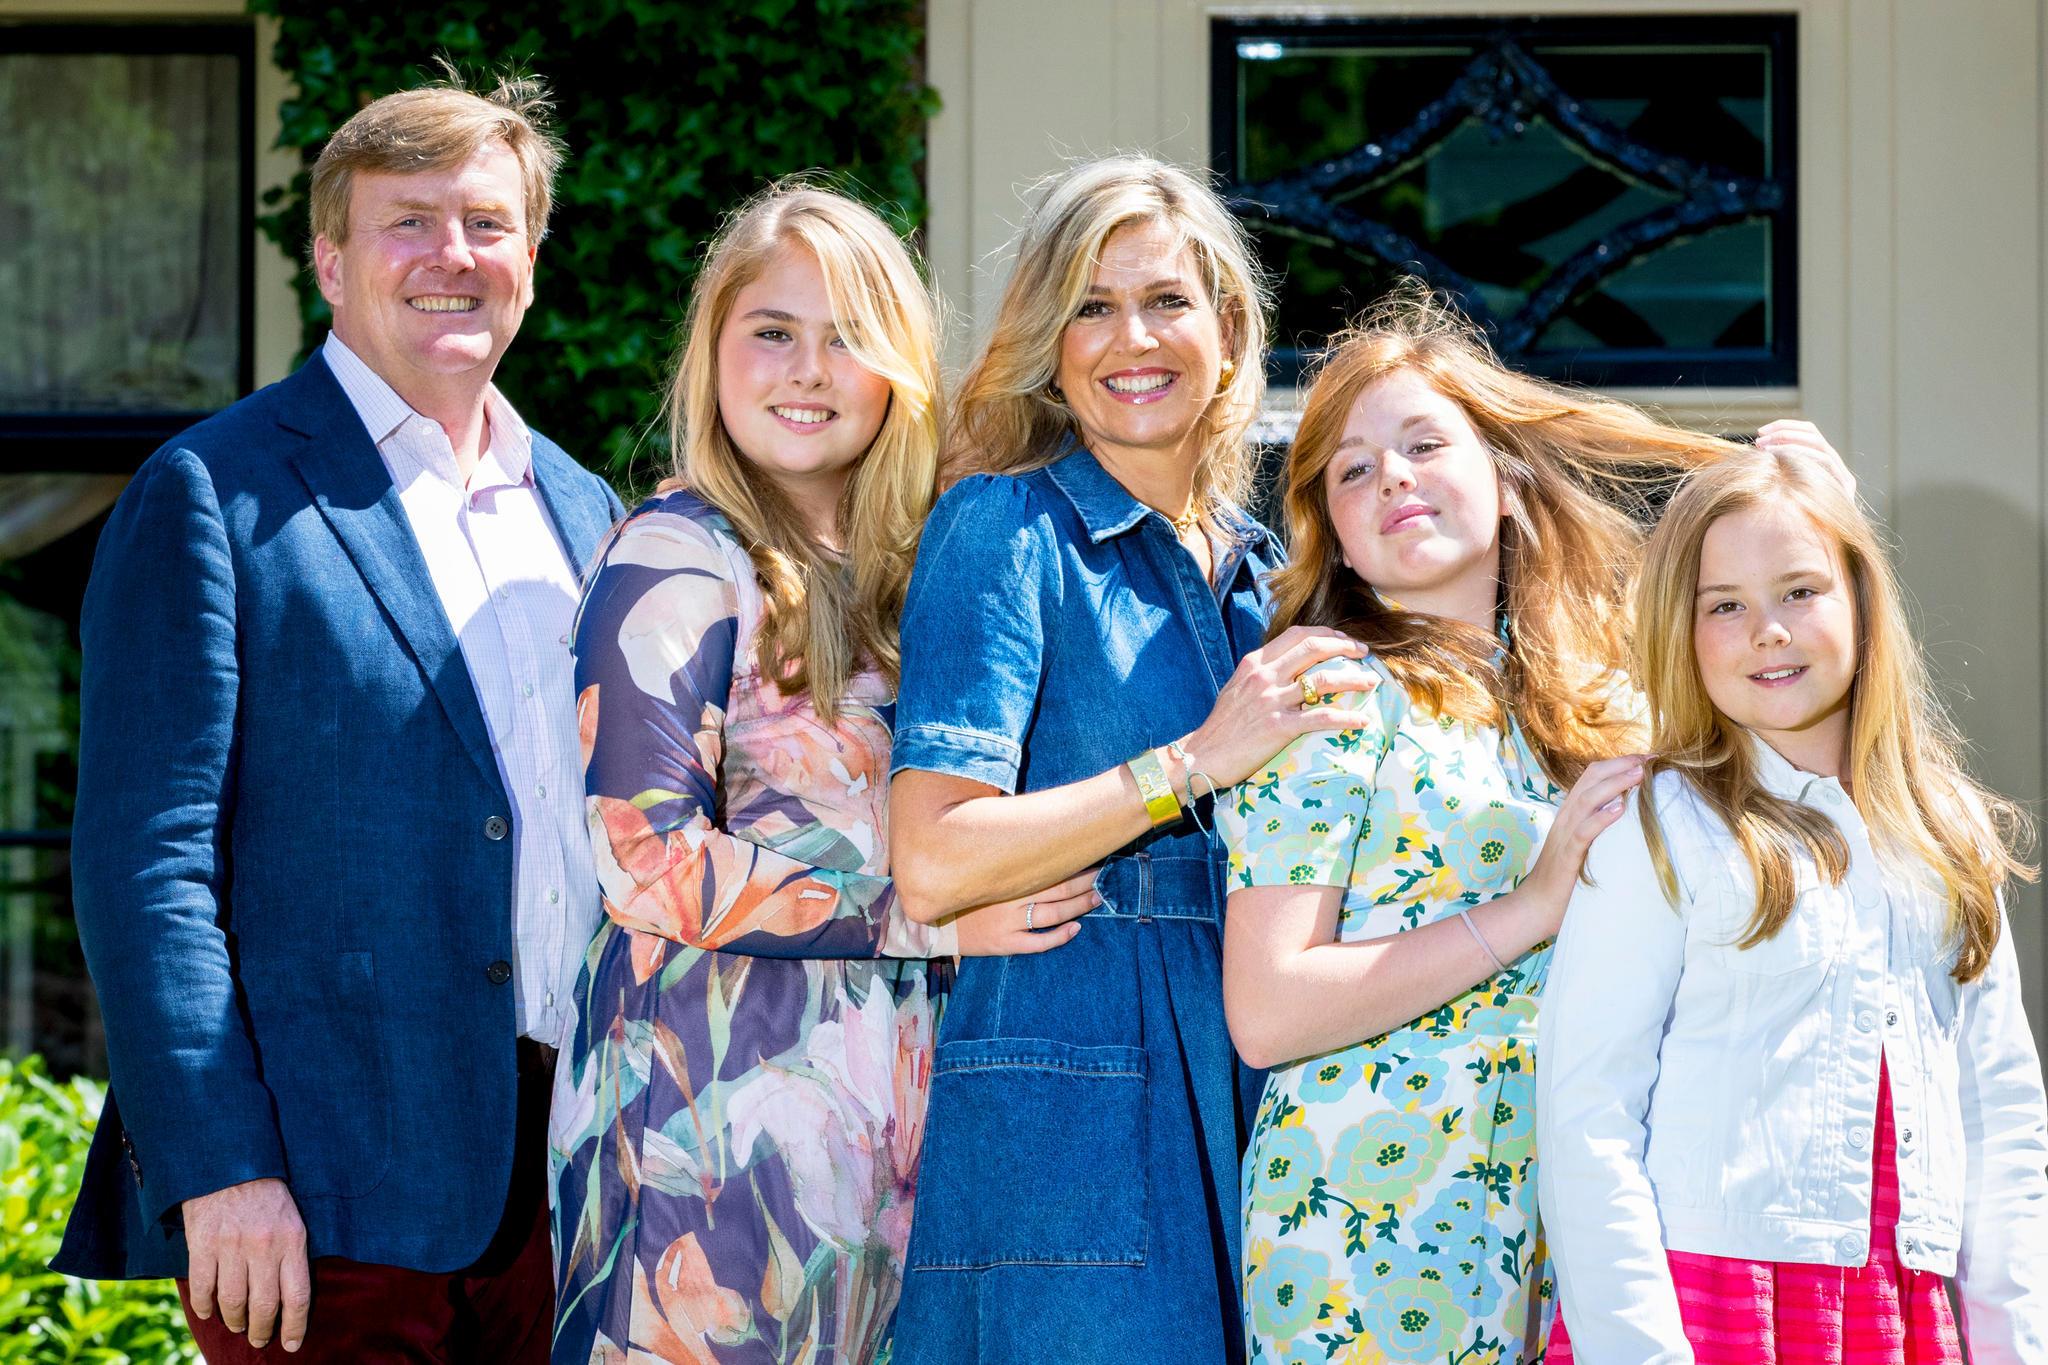 König Willem-Alexander, Prinzessin Amalia, Königin Máxima, Prinzessin Alexia und Prinzessin Ariane